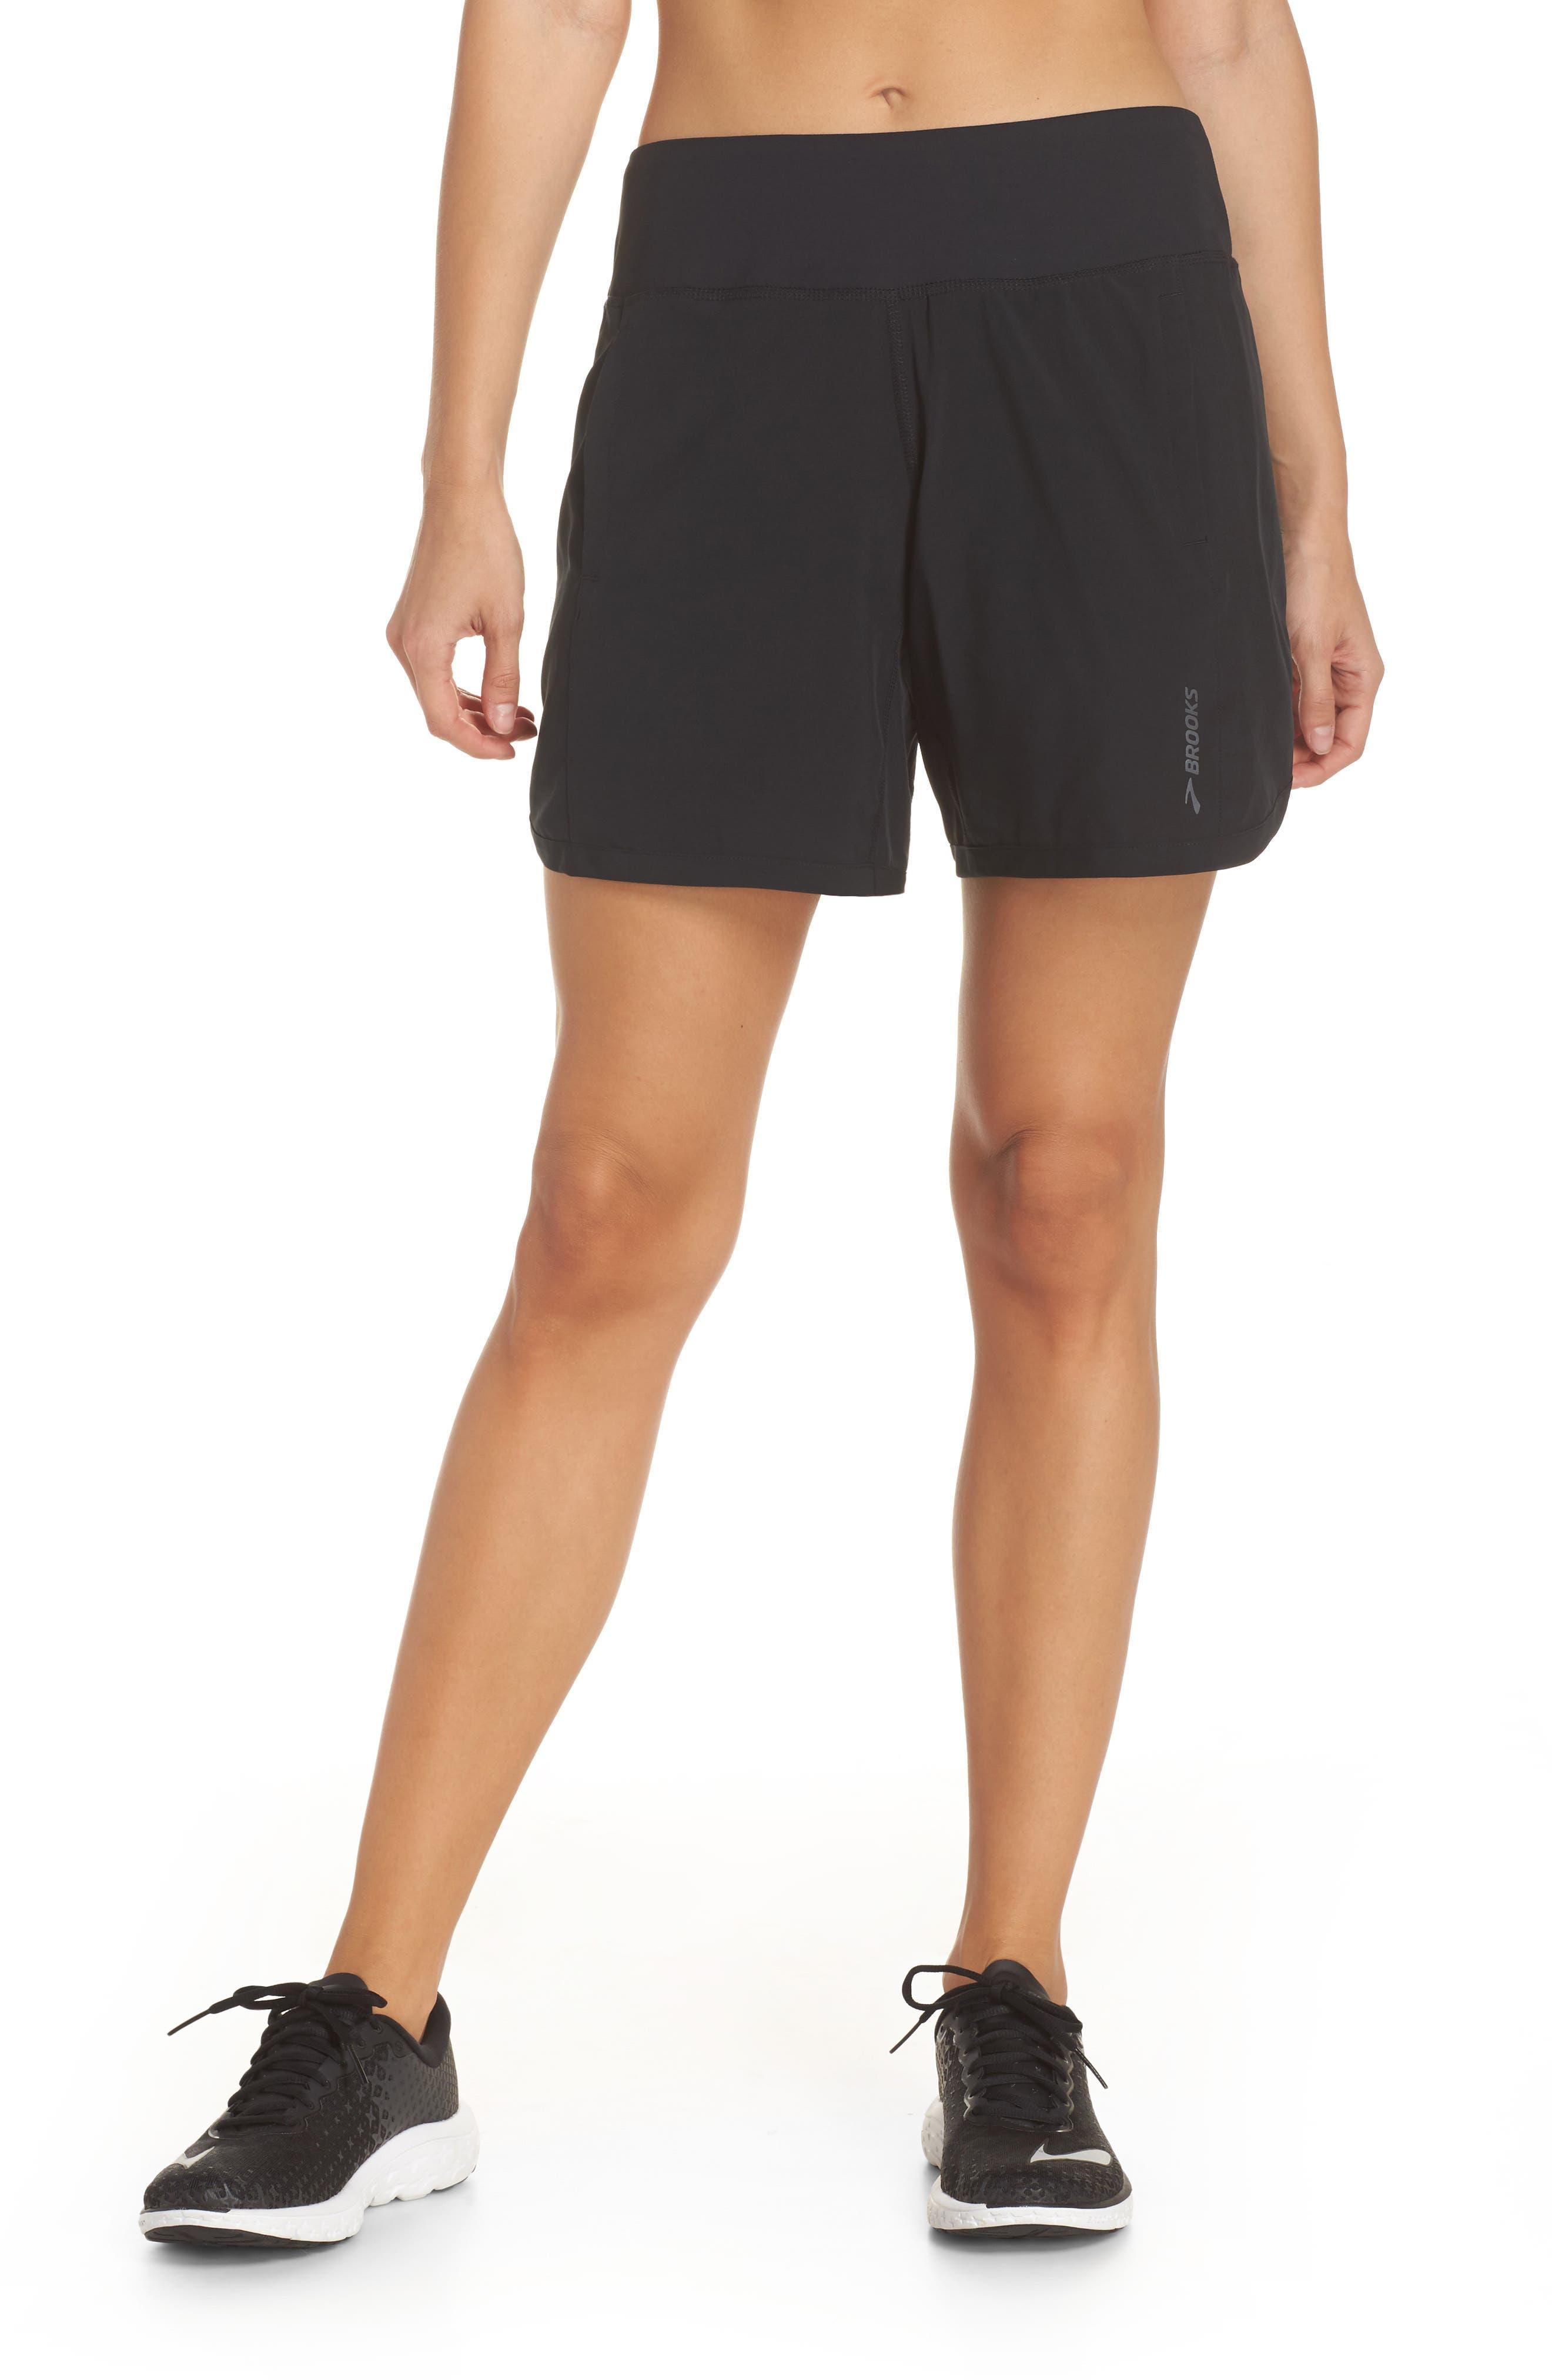 BROOKS Chaser 7 Shorts, Main, color, BLACK